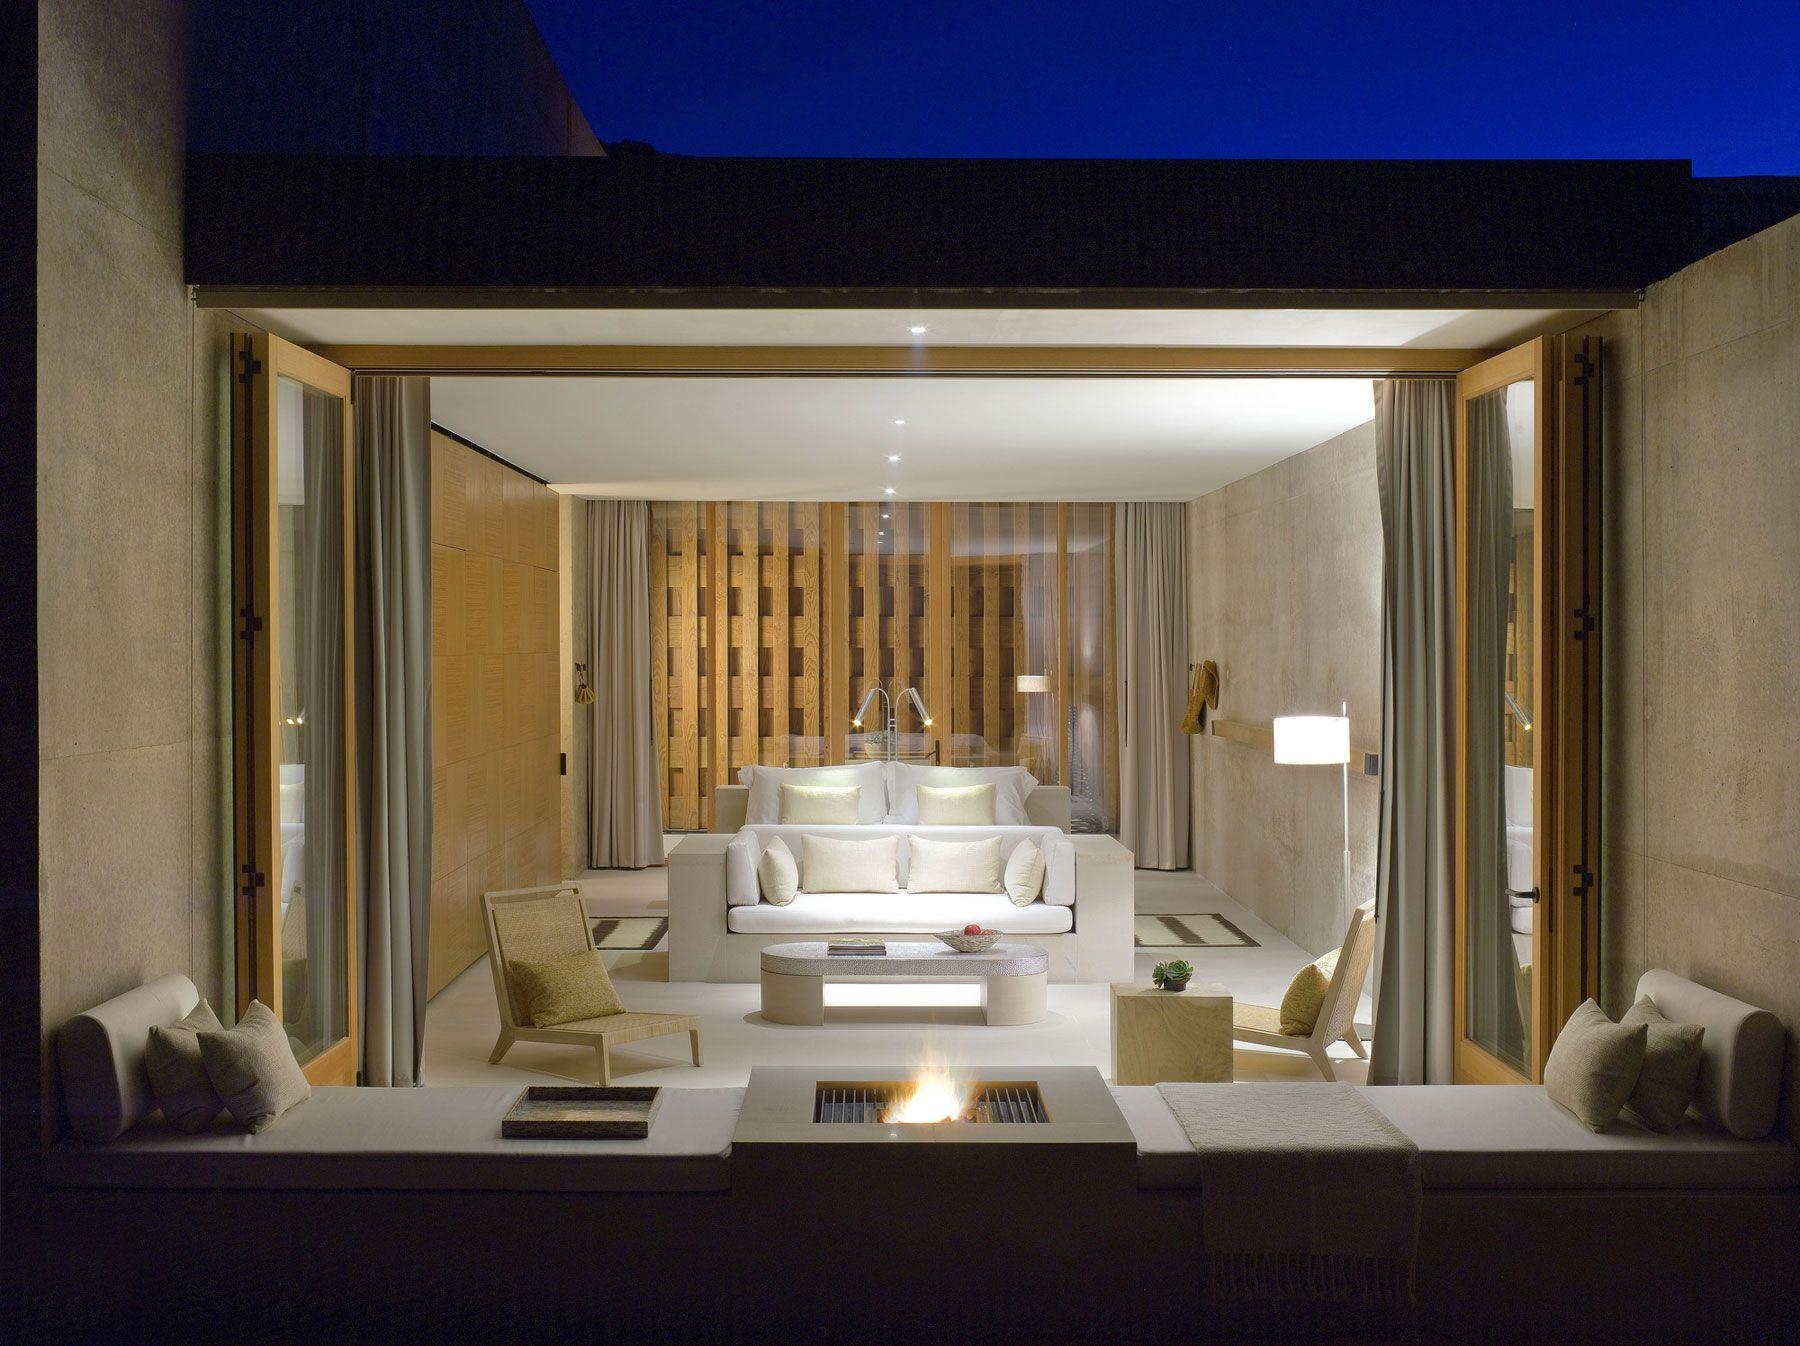 Amangiri-Luxury-Resort-Hotel-in-Canyon-Point-08-1